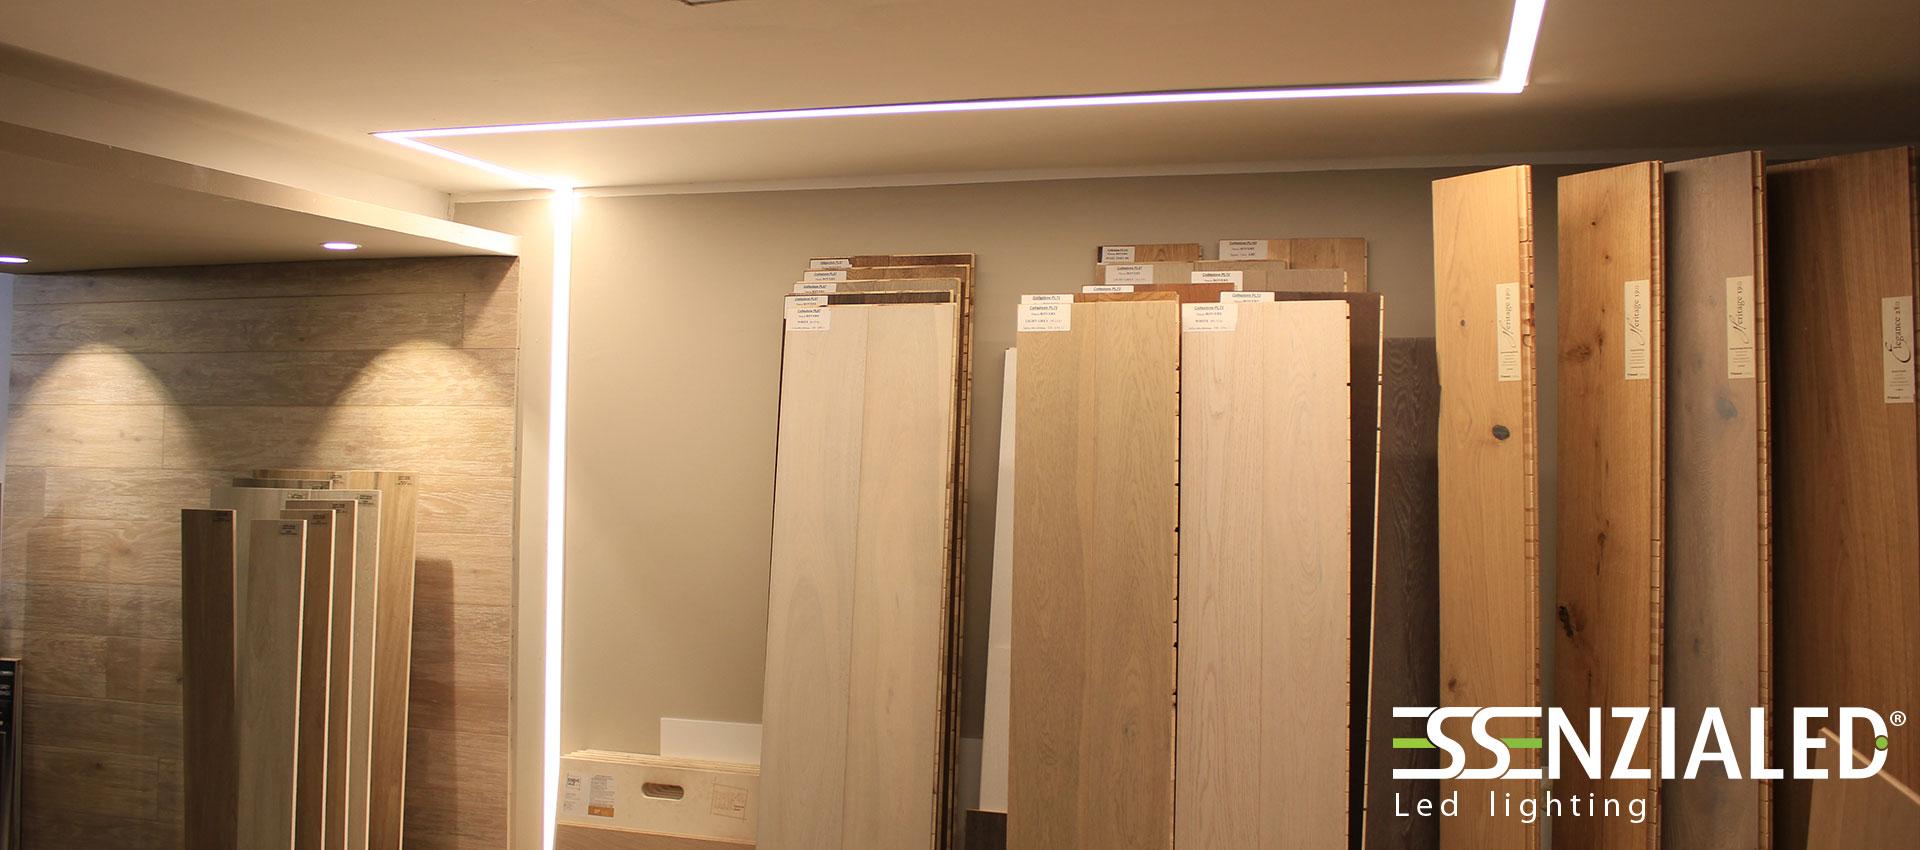 Luce Soffitto Cartongesso : INSIDE-Tagli di luce cartongesso a Led su ...